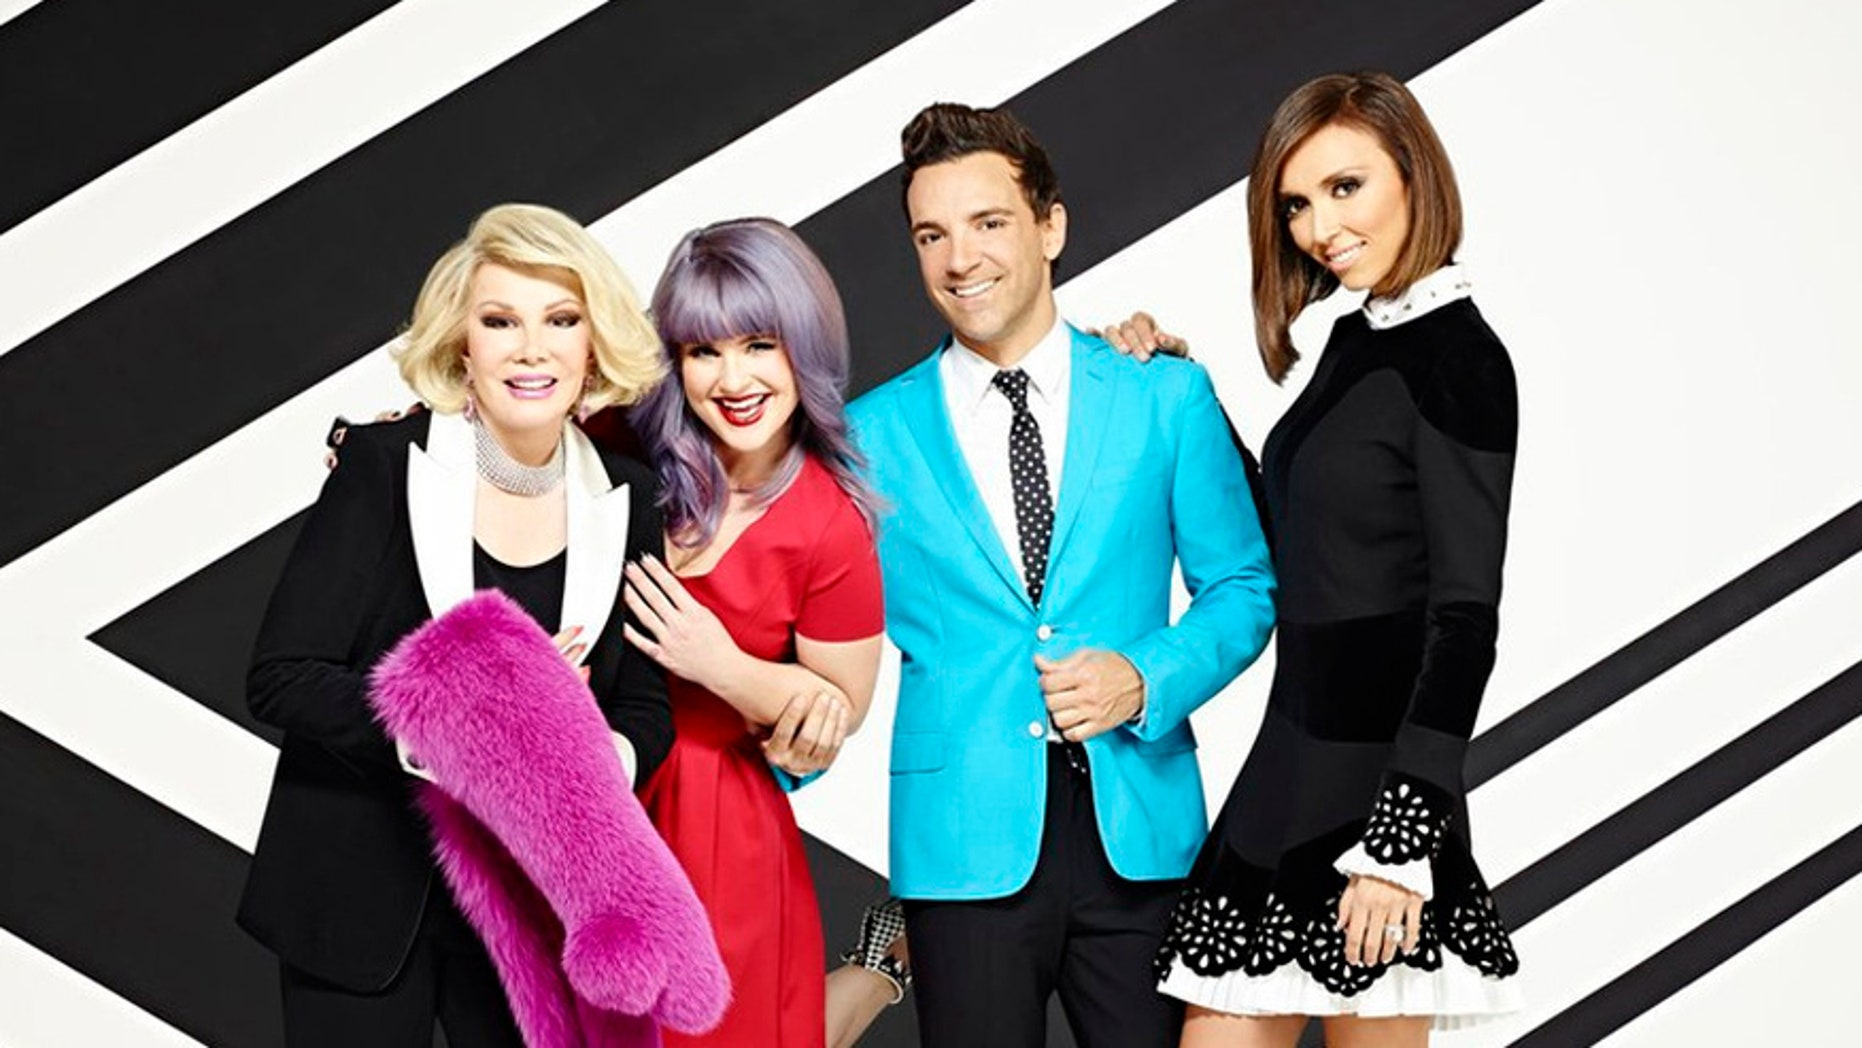 Joan Rivers, Kelly Osbourne, George Kotsiopoulos, Giuliana Rancic  (Photo by: Brian Bowen Smith/E!)